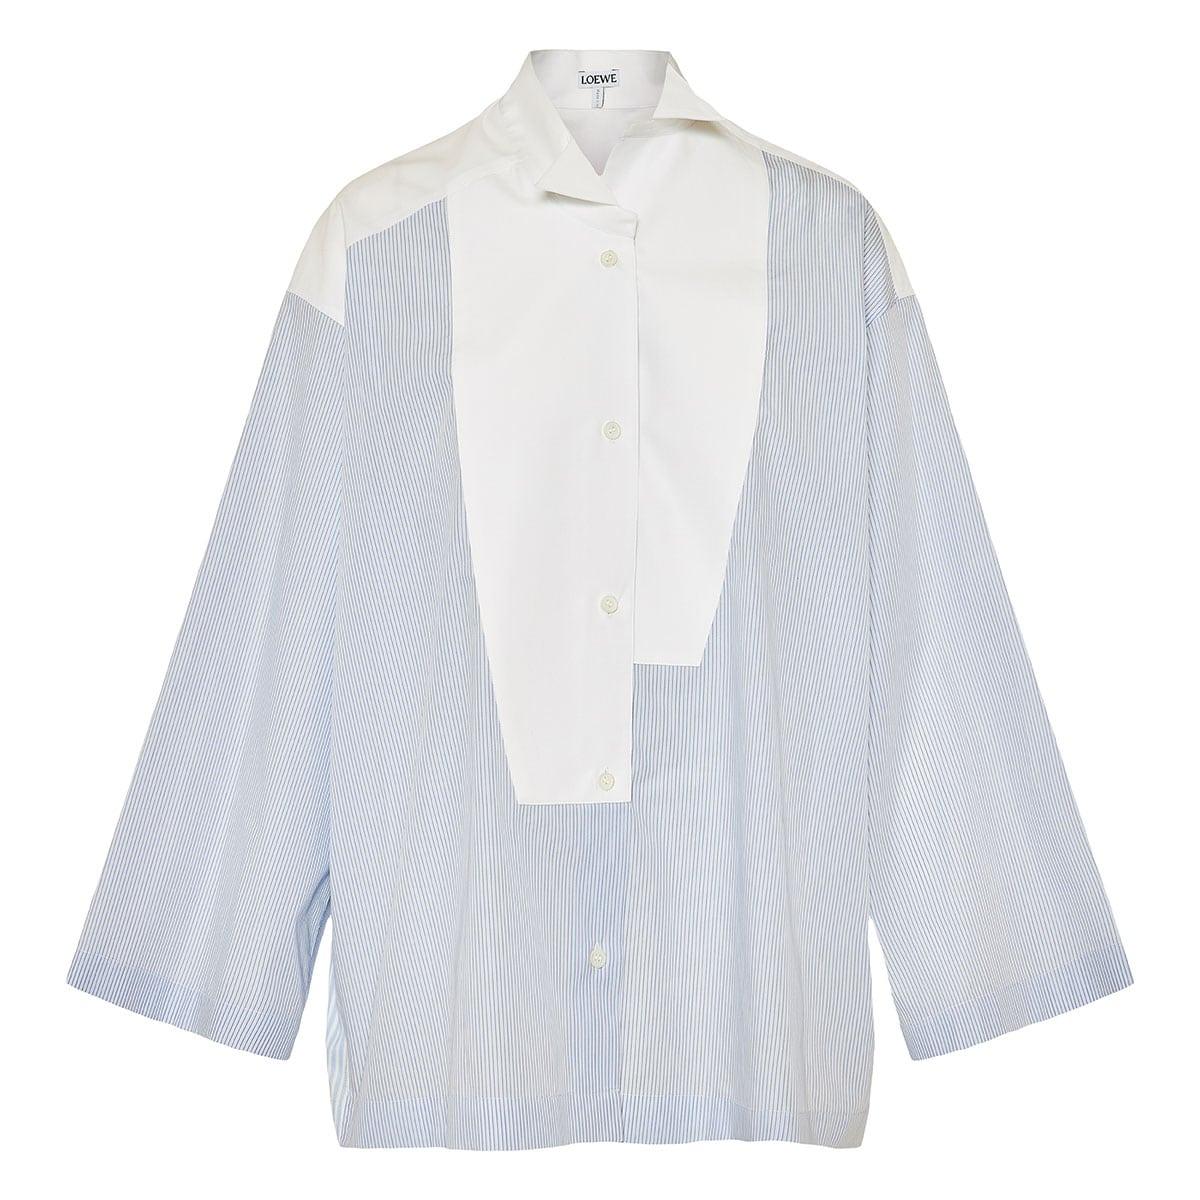 Oversized asymmetric striped shirt